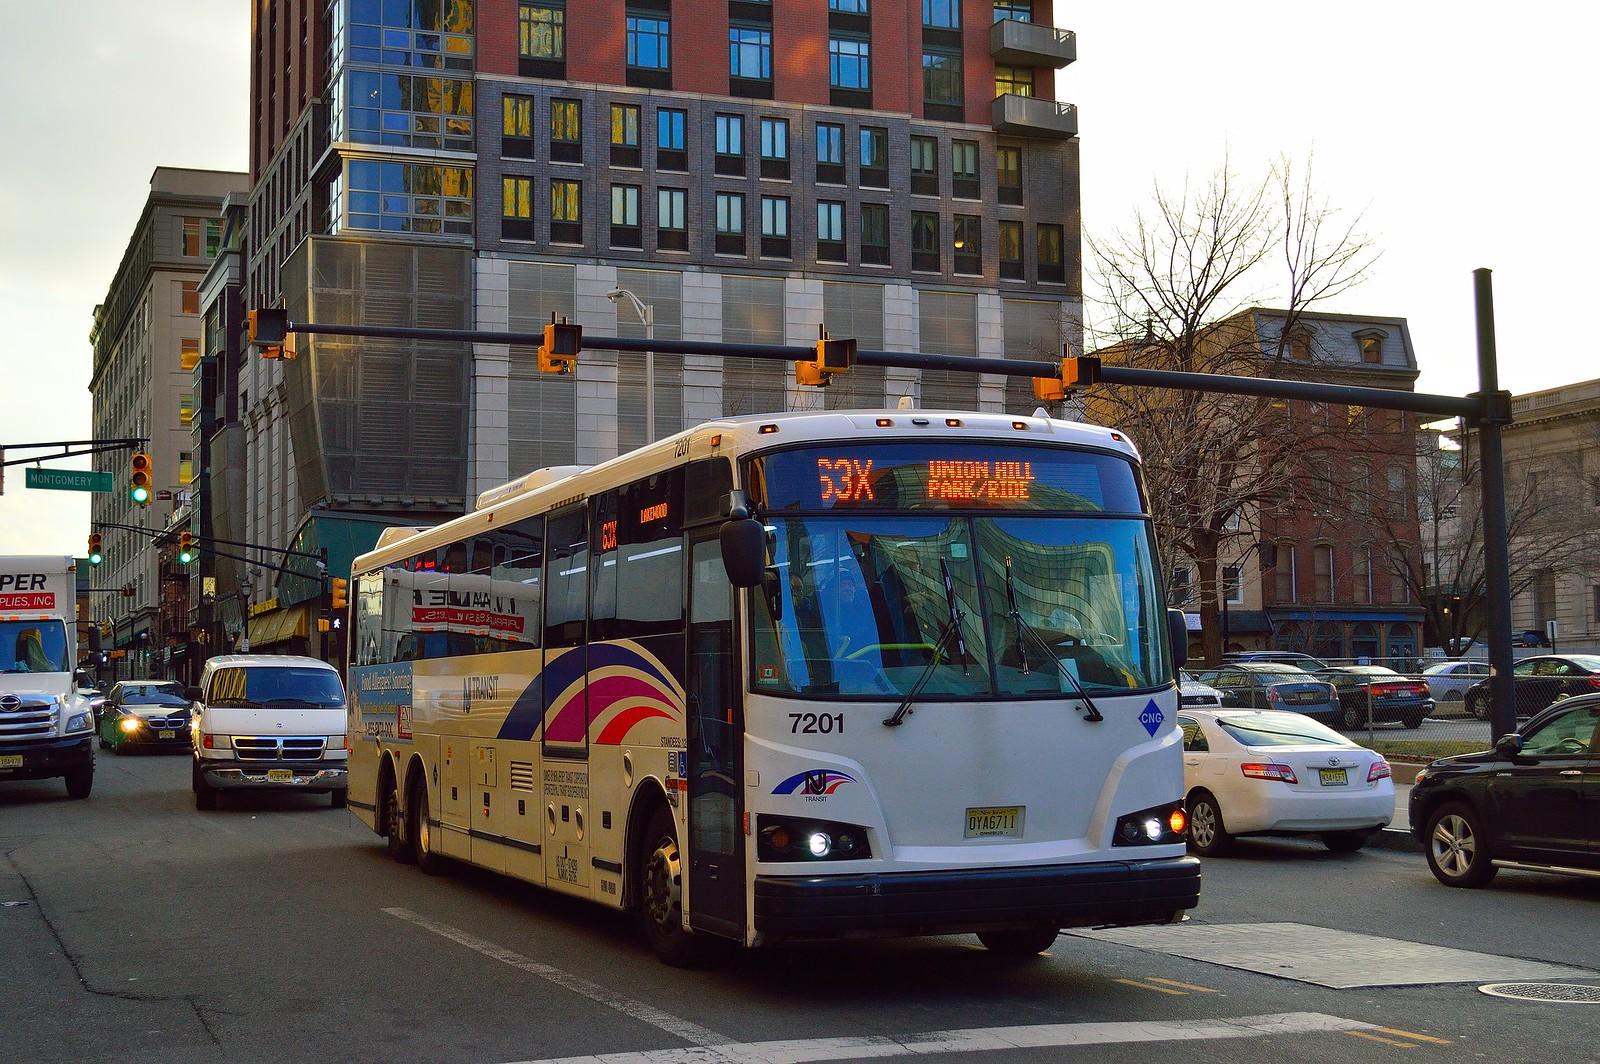 Nj Transit Bus Toy Www Tollebild Com